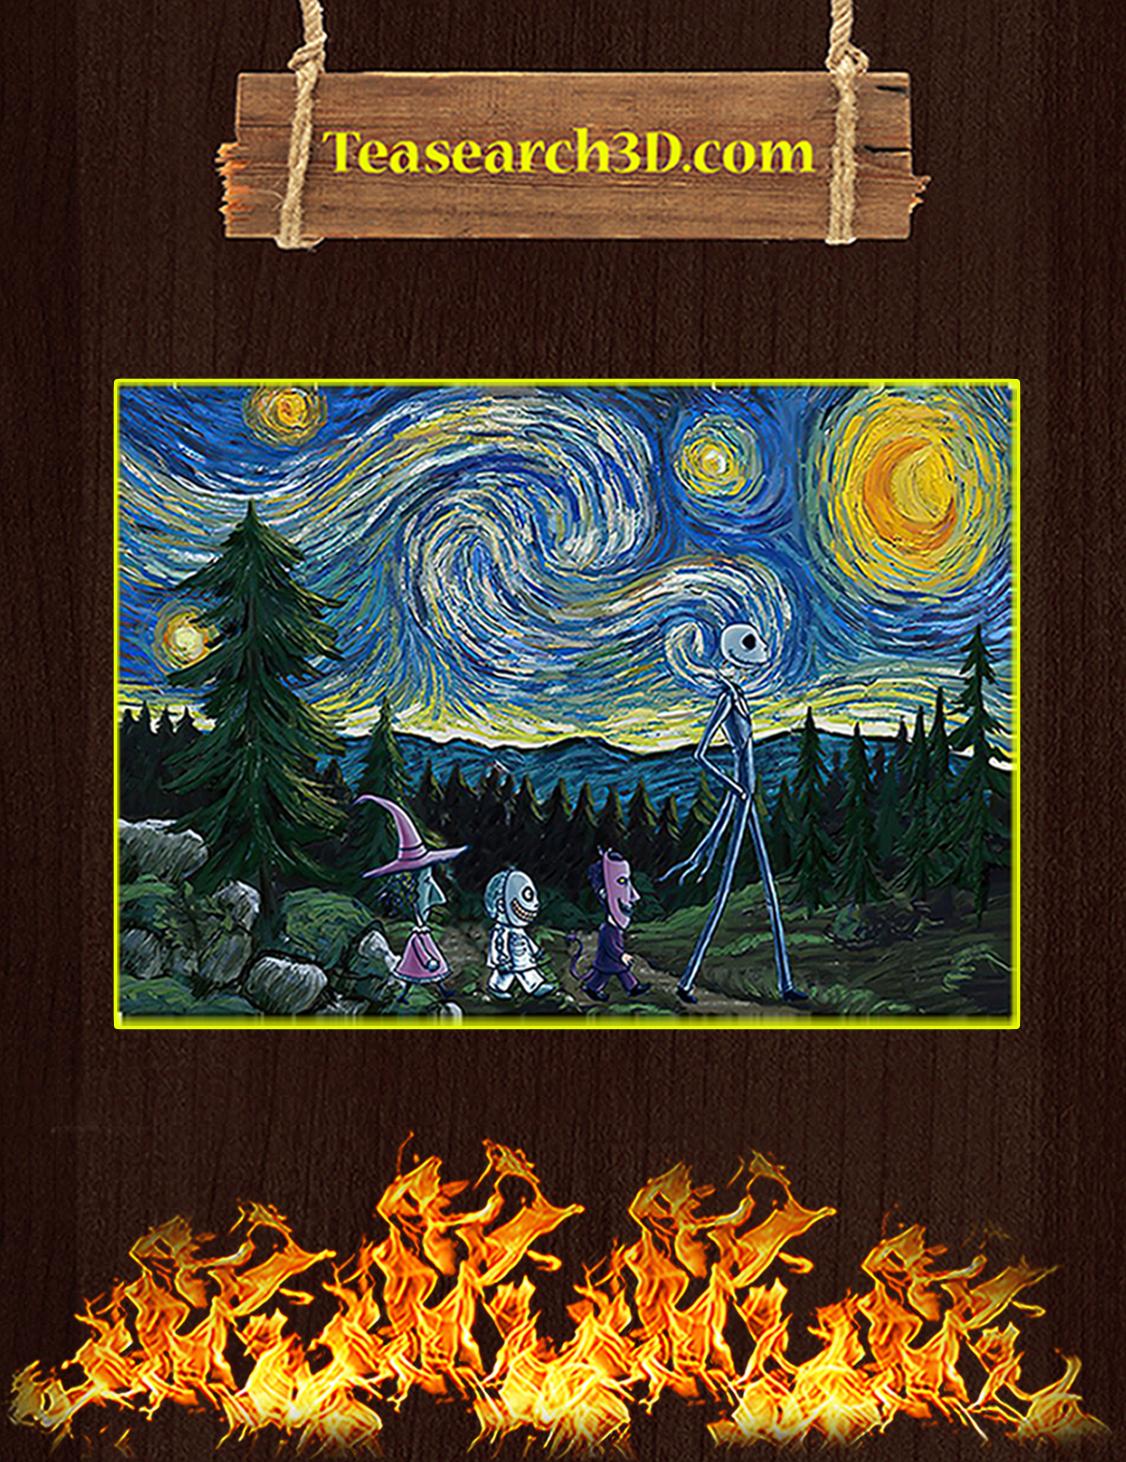 Jack skellinton starry nightmare poster A3